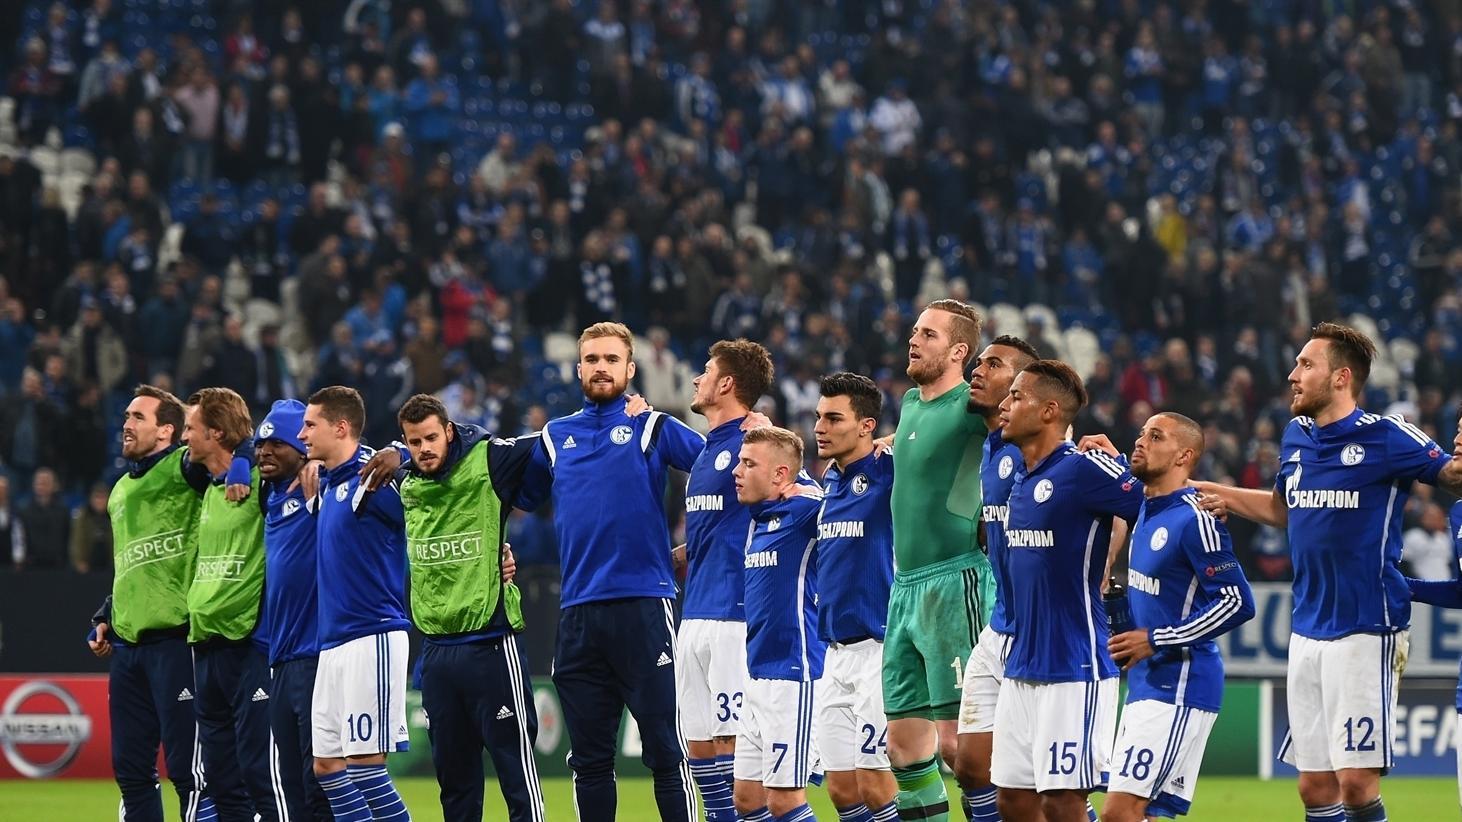 Sporting v Schalke background   UEFA Champions League - UEFA.com